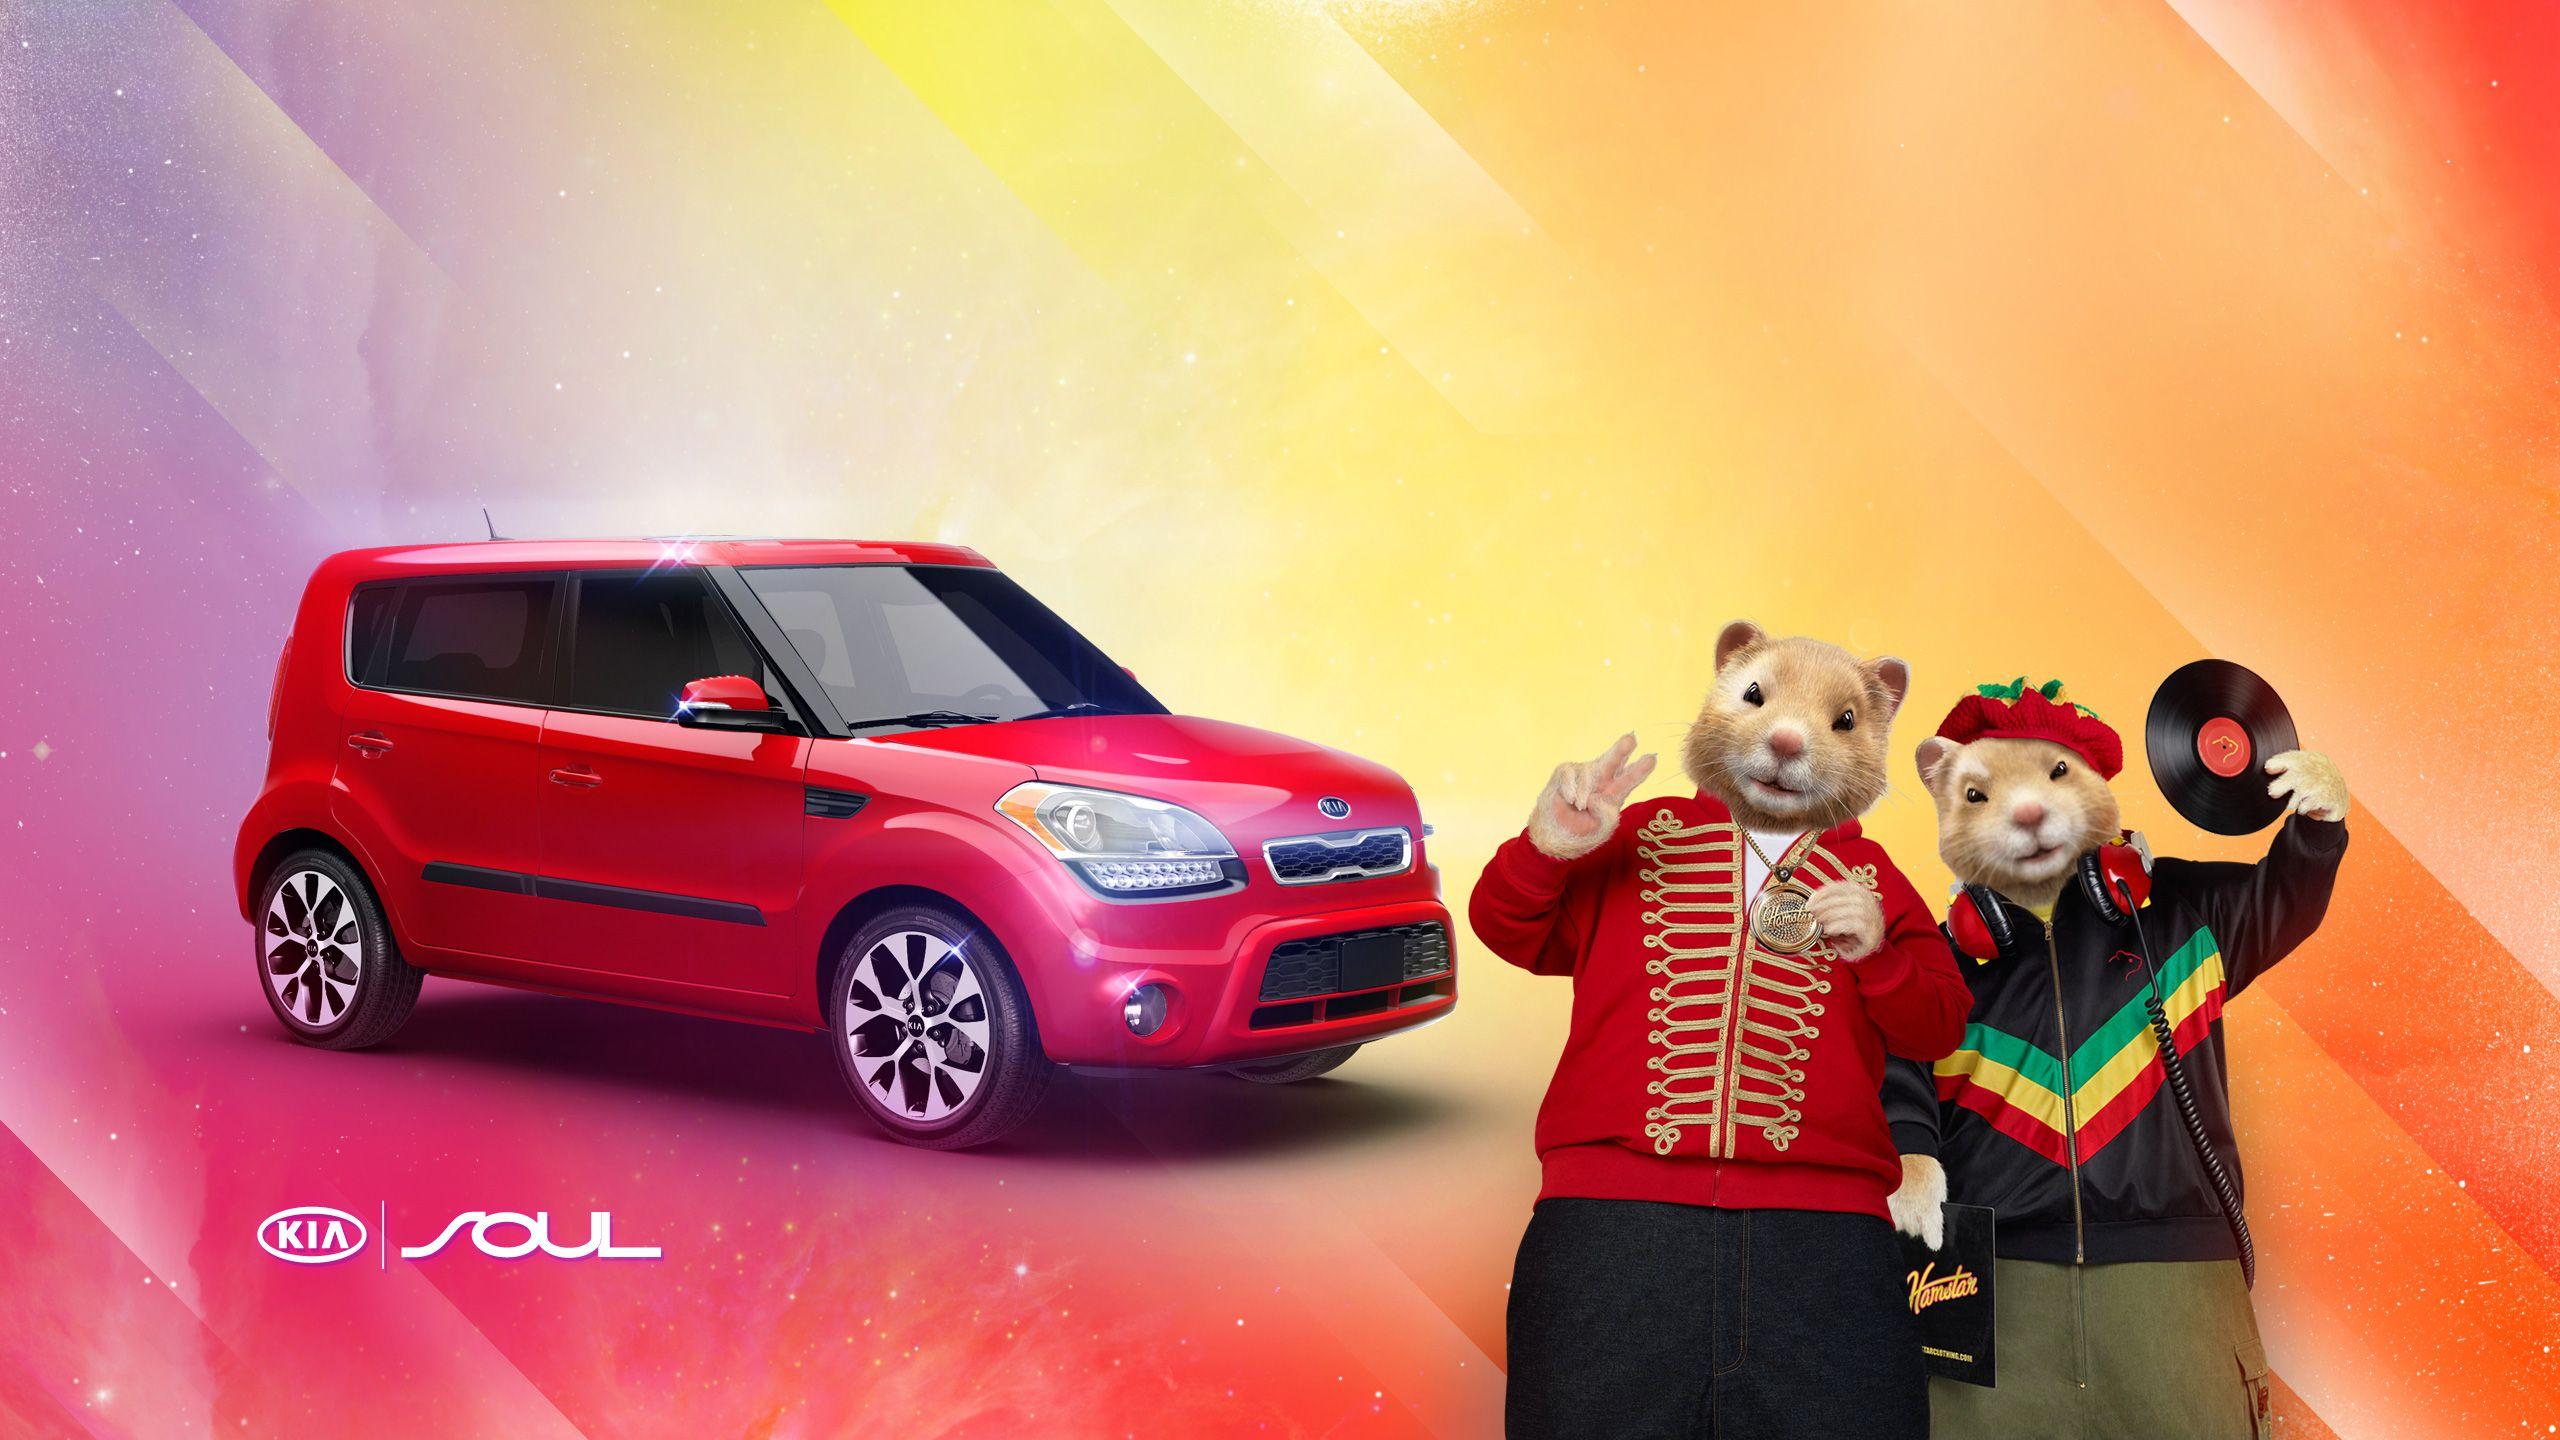 Kia Soul Hamster >> New Kia Soul Hamster Window Decal Up84 Advancedmassagebysara